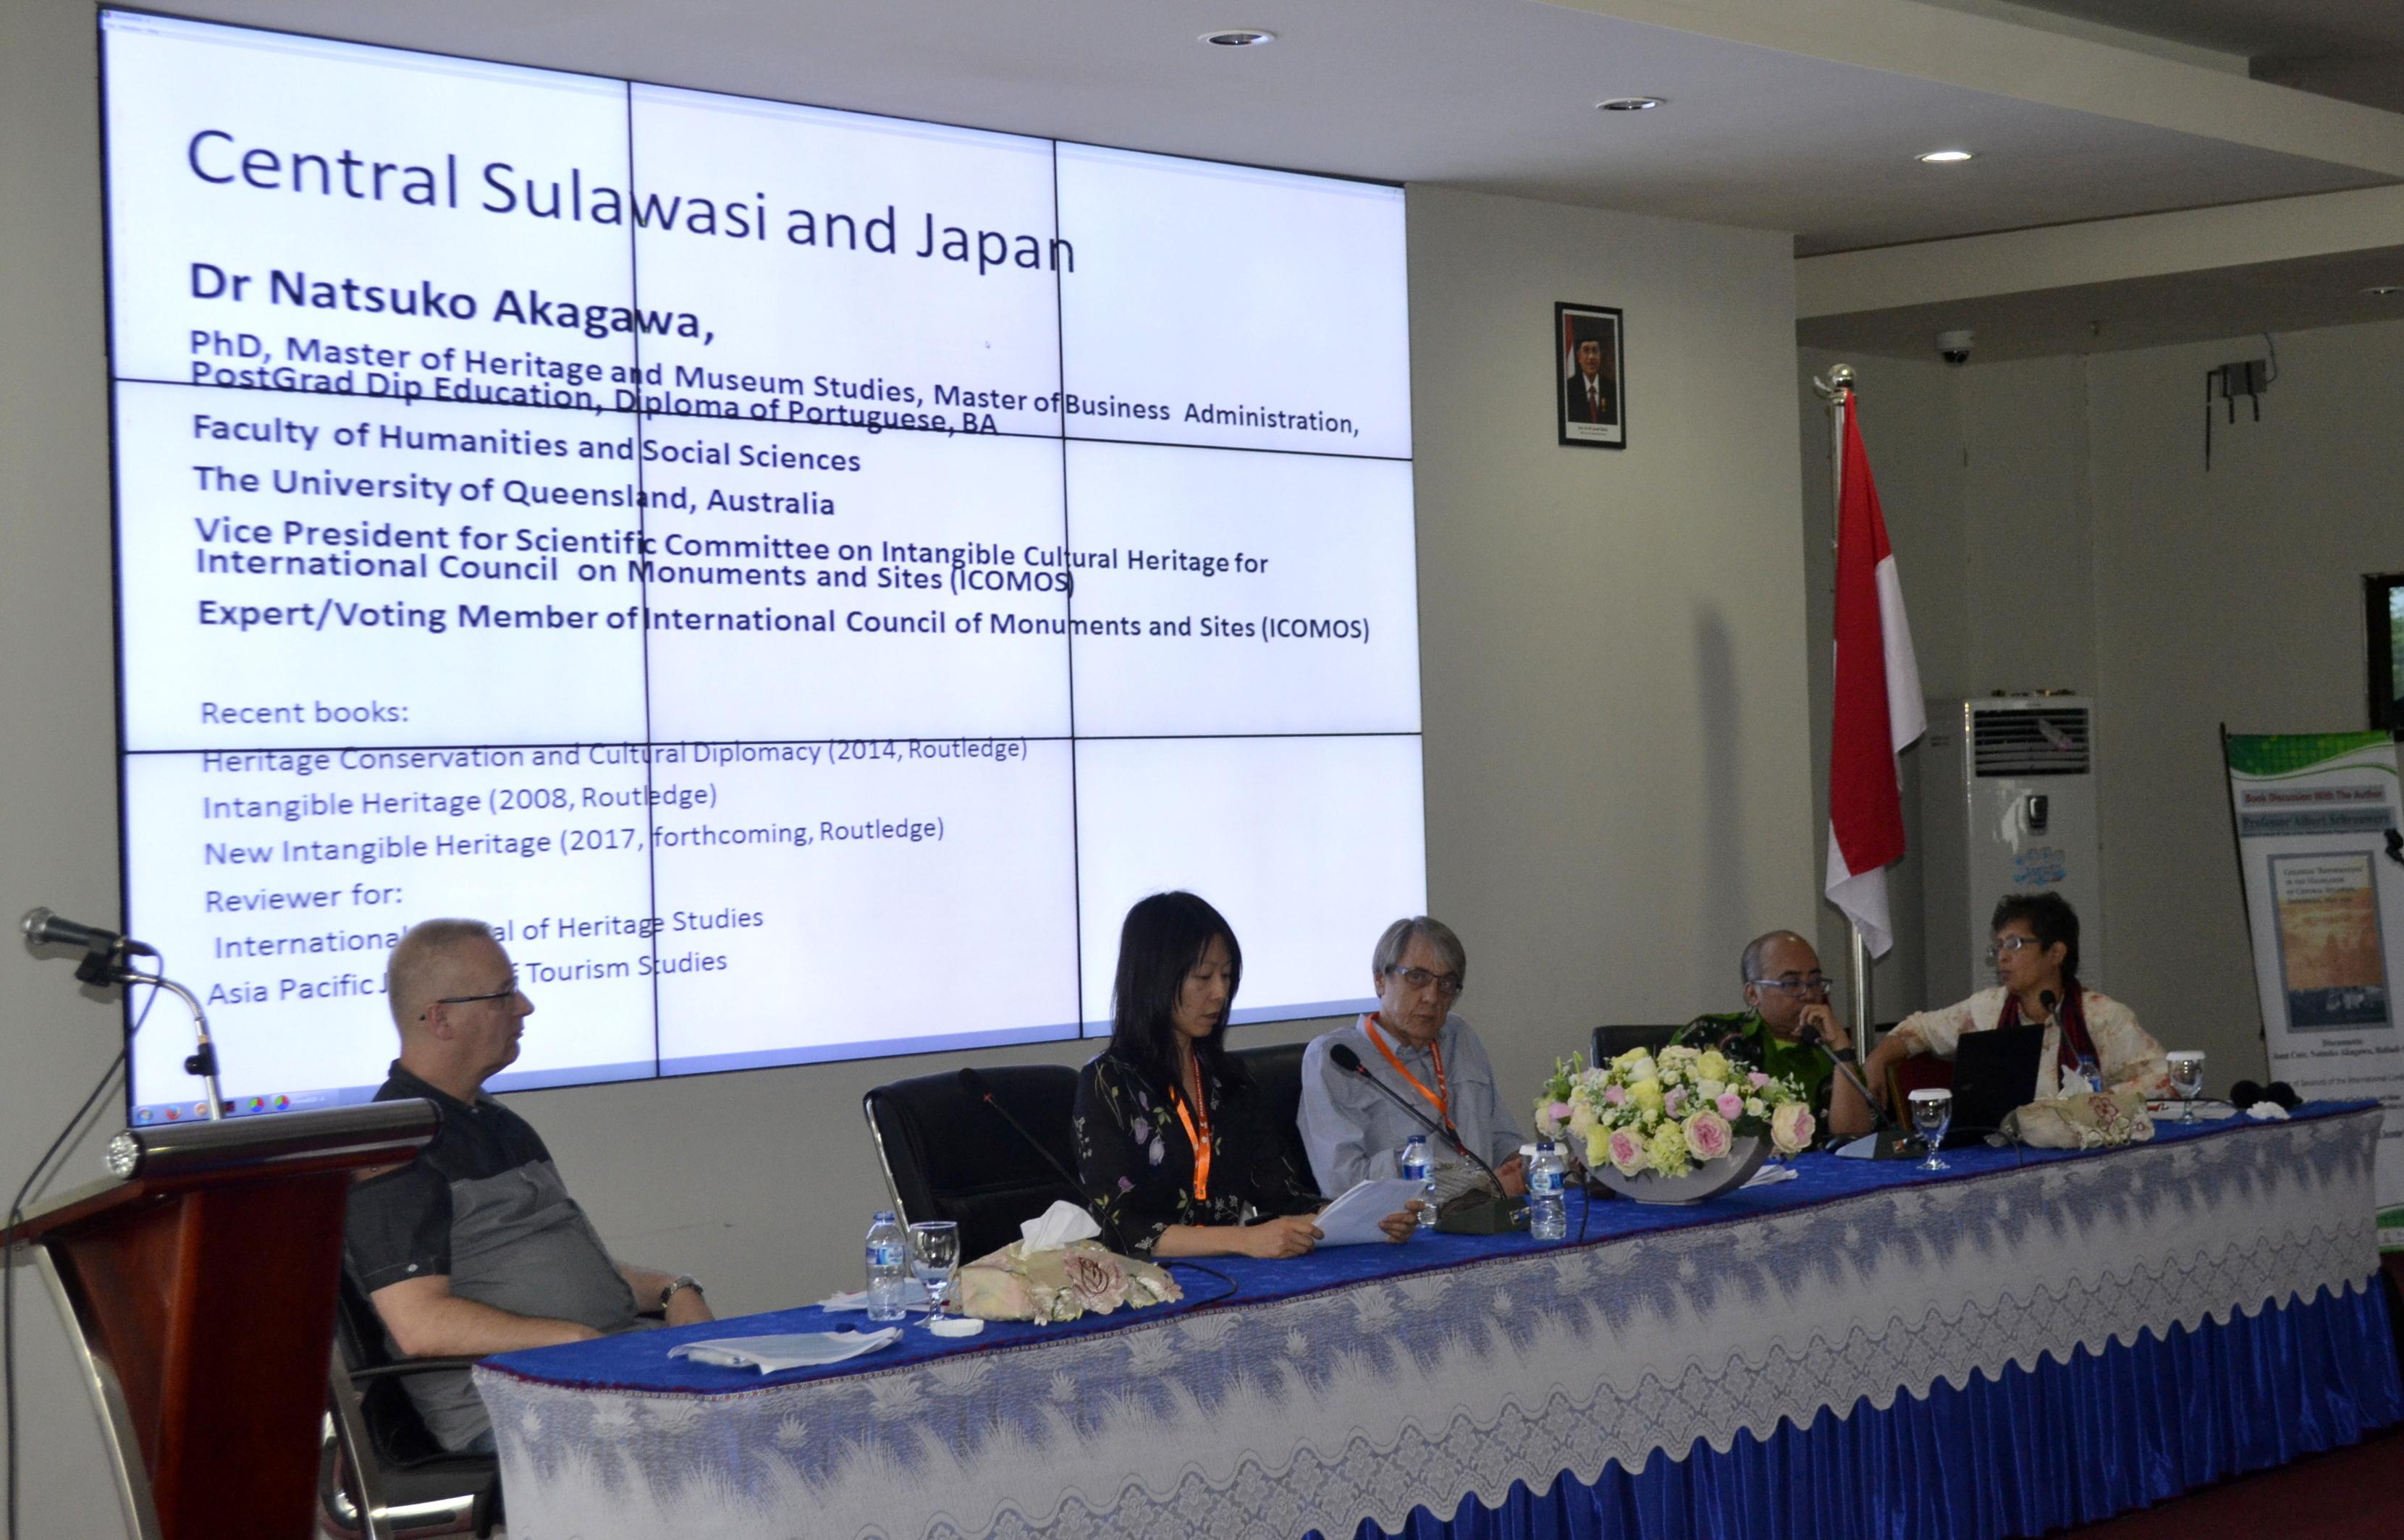 Sejumlah Pakar Sosial Asal Amerika, Kanada, Jepang & Australia Hadiri Konferensi Internasional Antropologi Untad